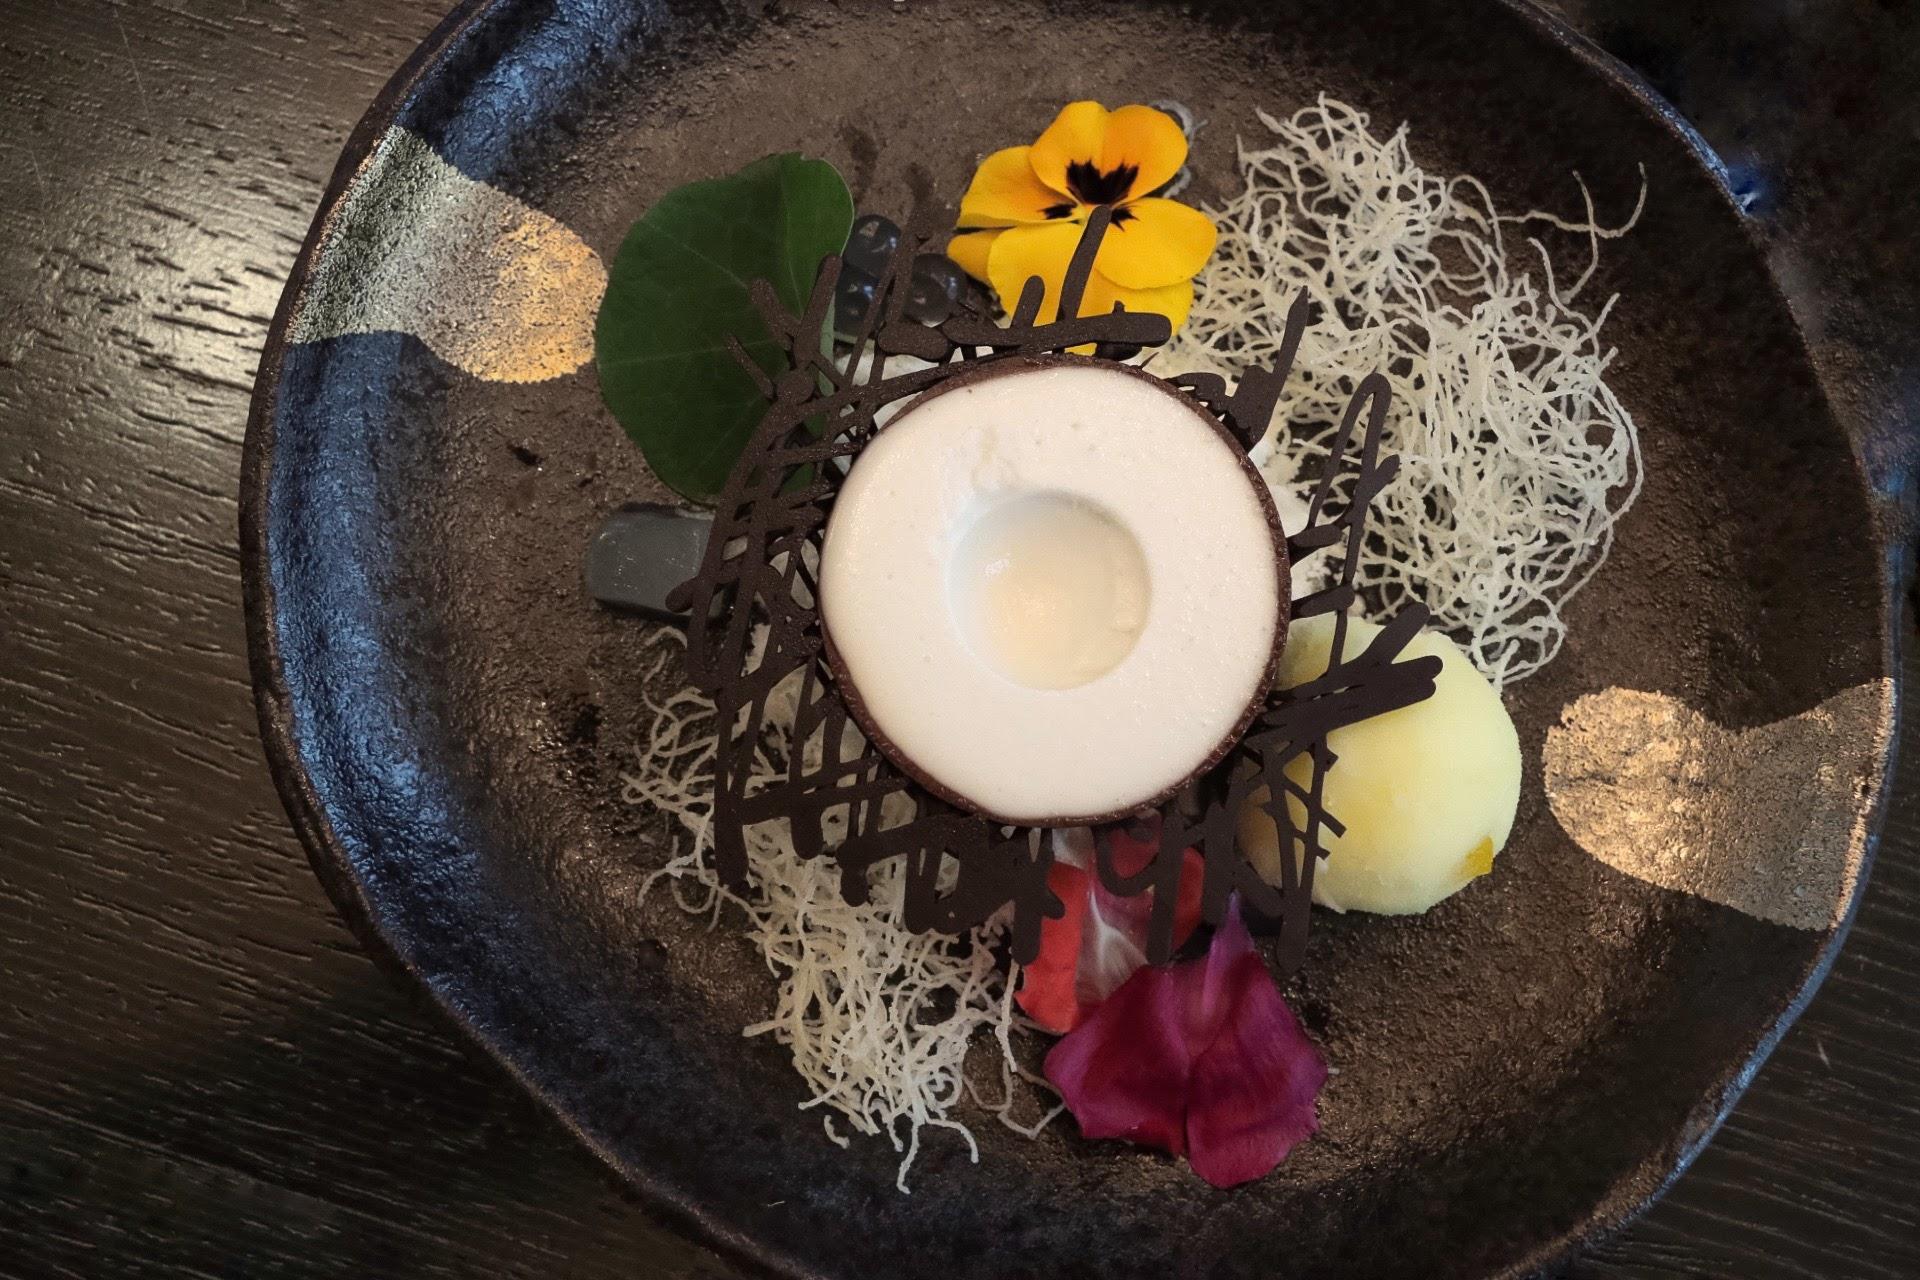 Armani Aqua, Cool Baby Coco Coconut, Sake Mousse